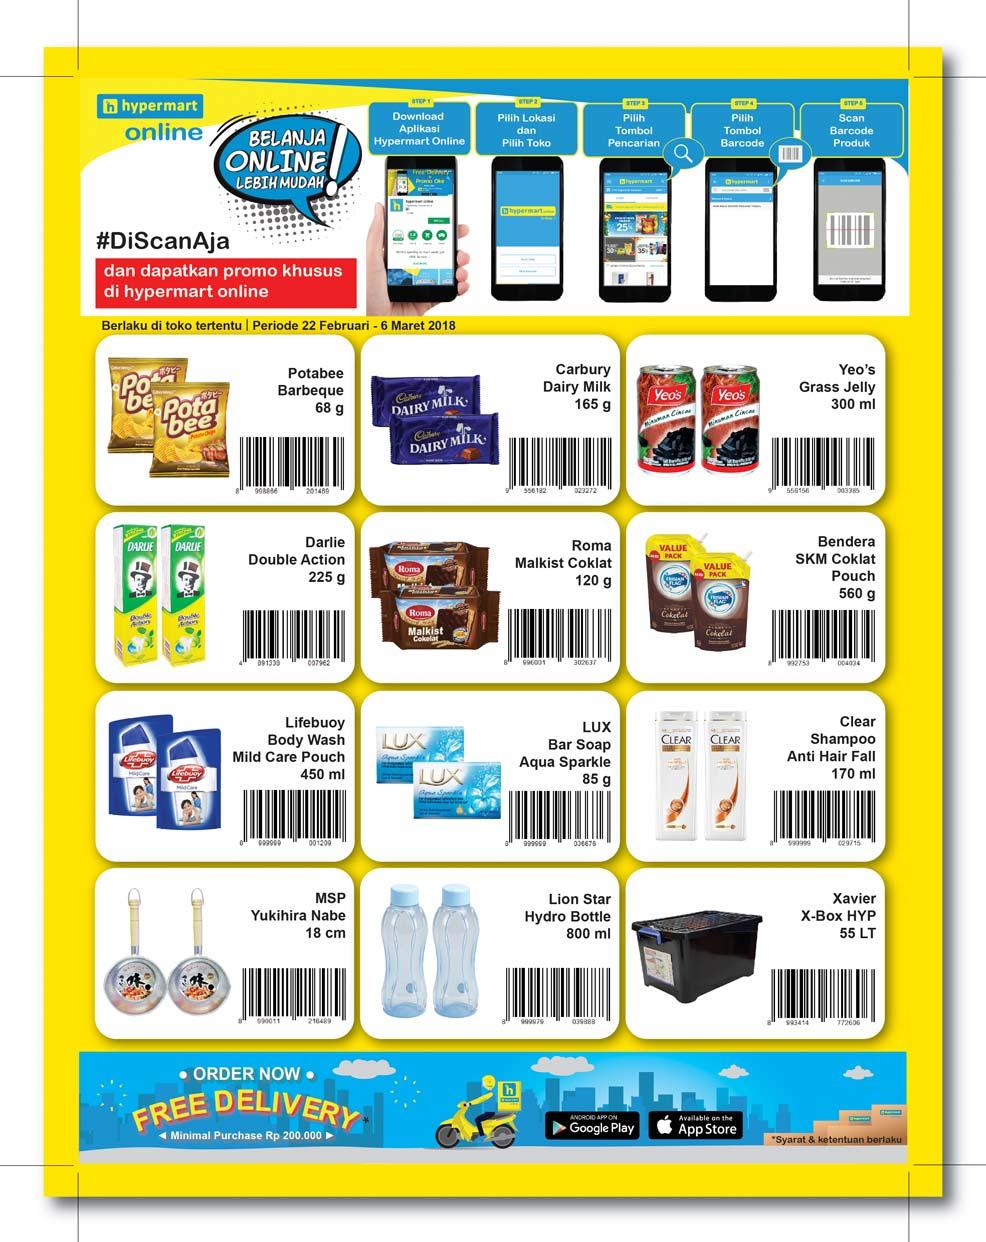 Katalog Promo Hypermart Terbaru Periode 22 Februari 06 Maret 2018 Voucher Belanja